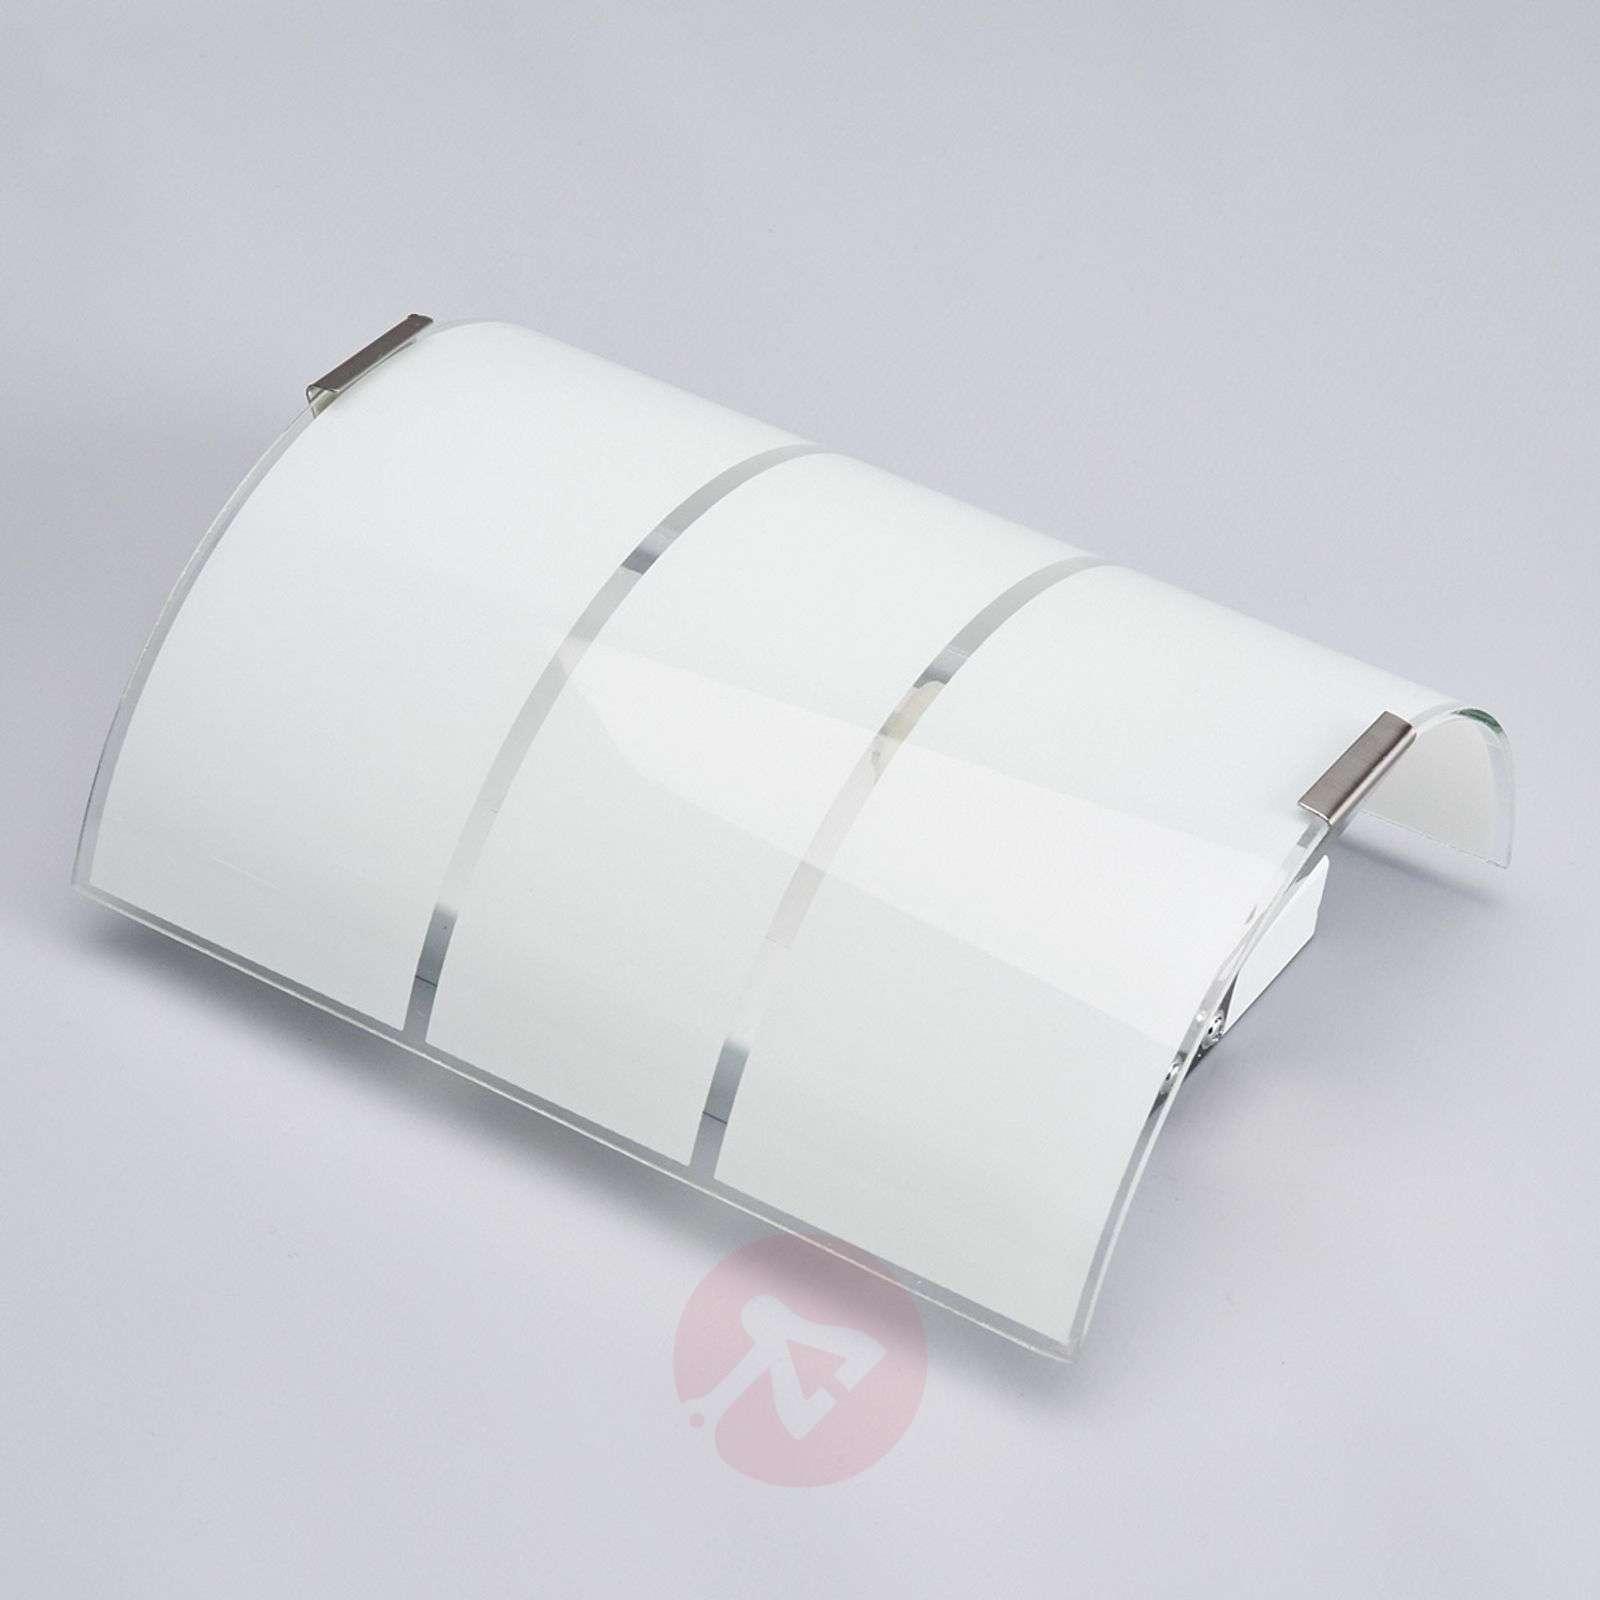 Vincenzo Glass Wall Lamp-9625001-01